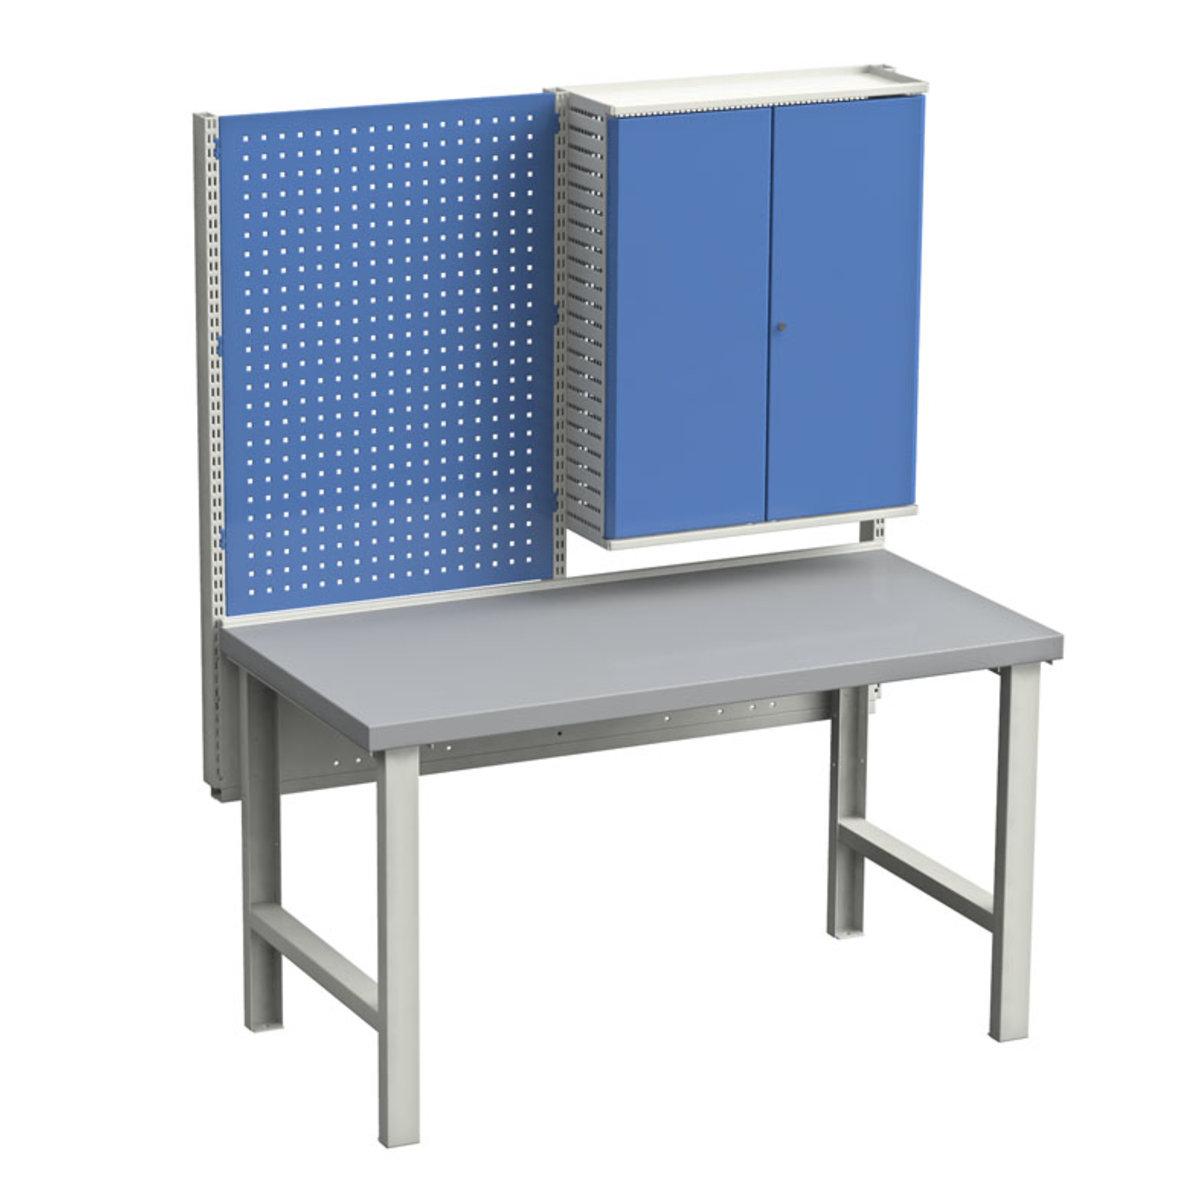 Workshop workbench for heavy-duty uses | Treston